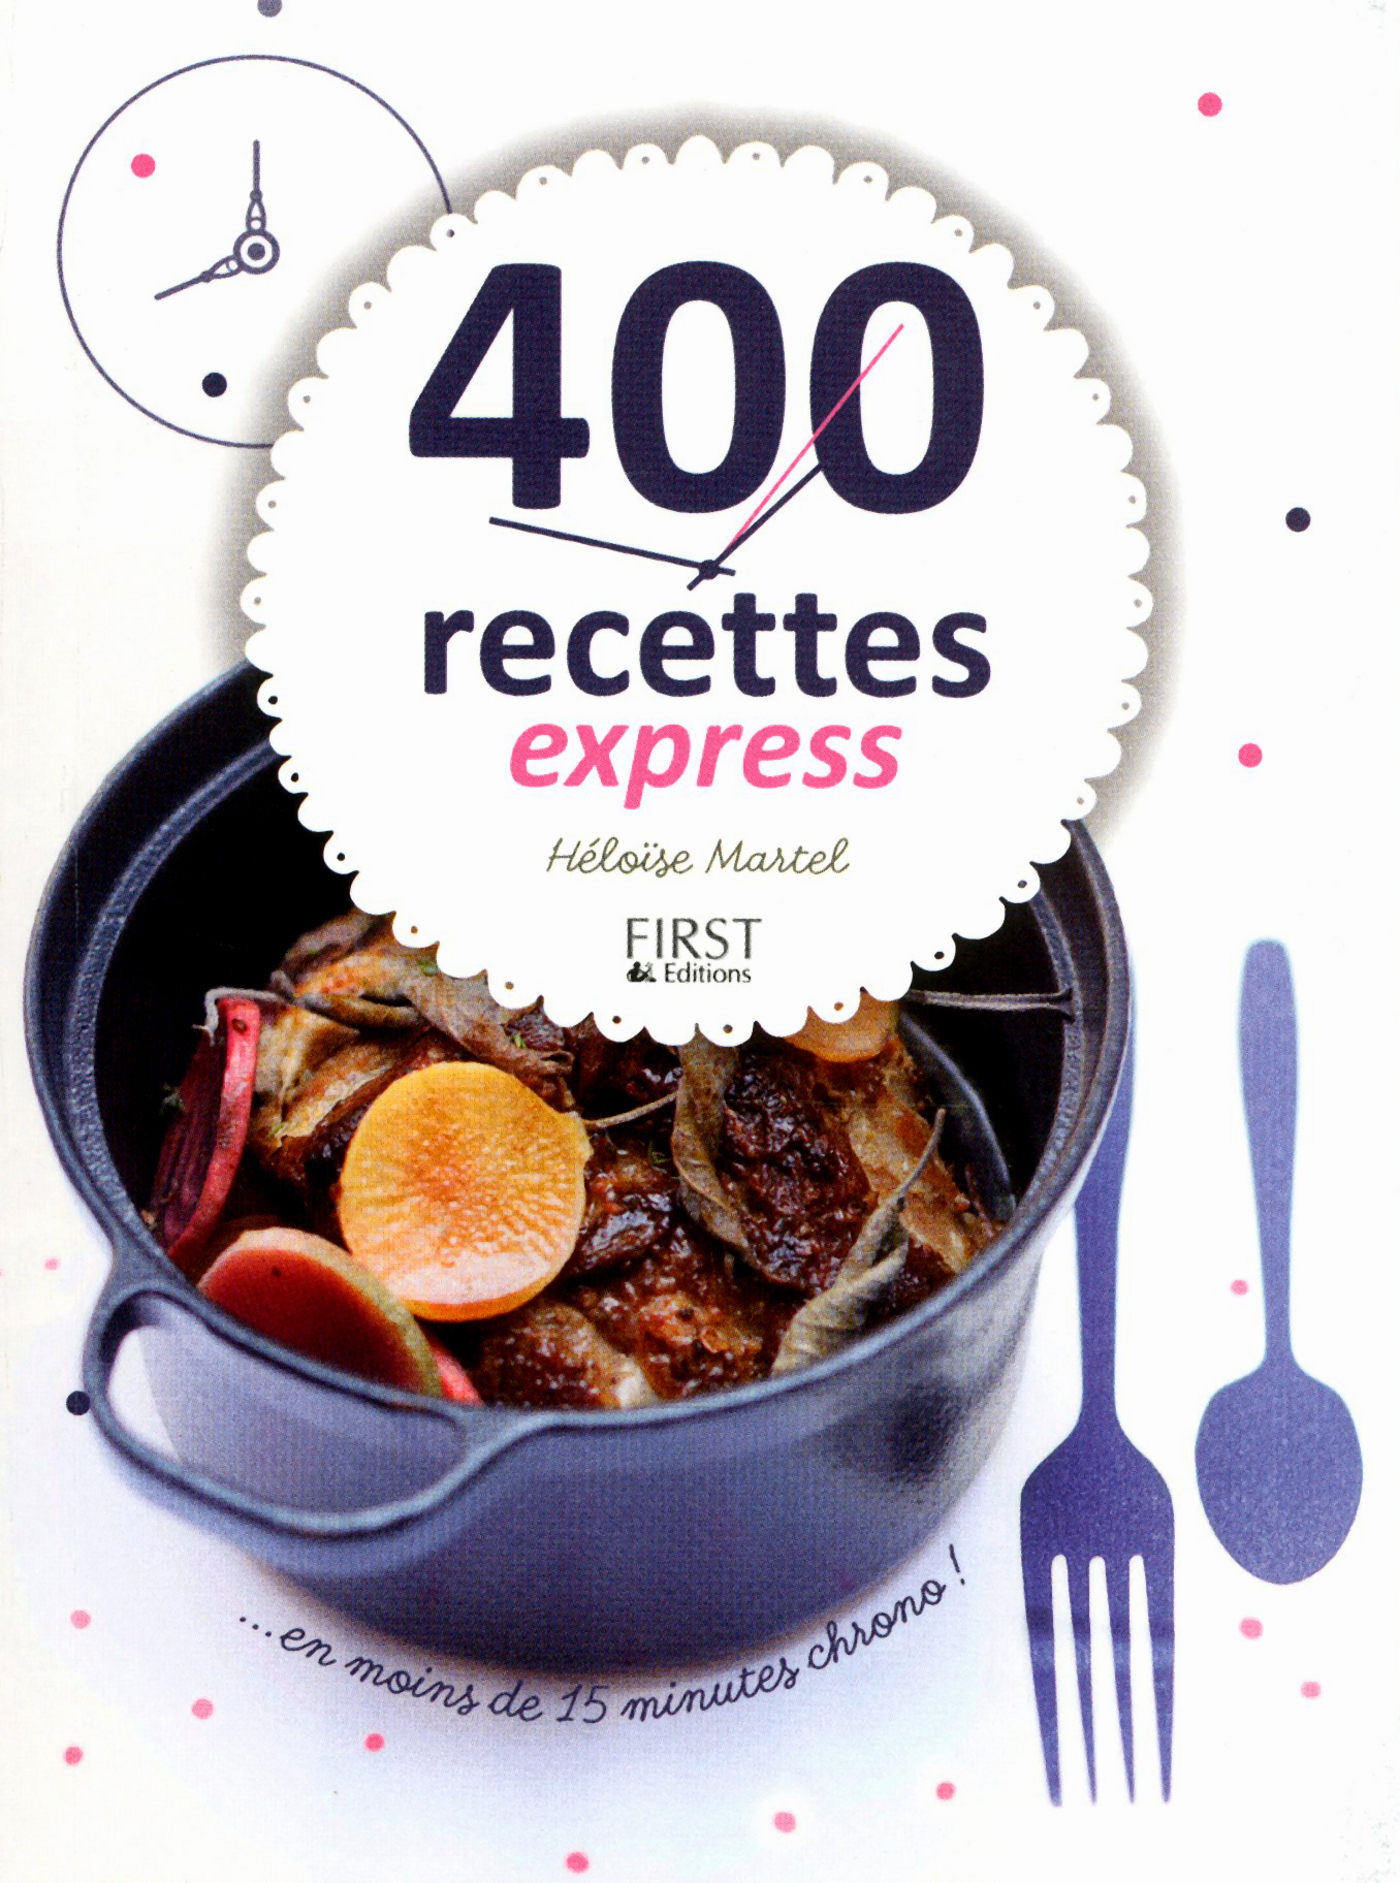 400 recettes express en moins de 15 minutes chrono